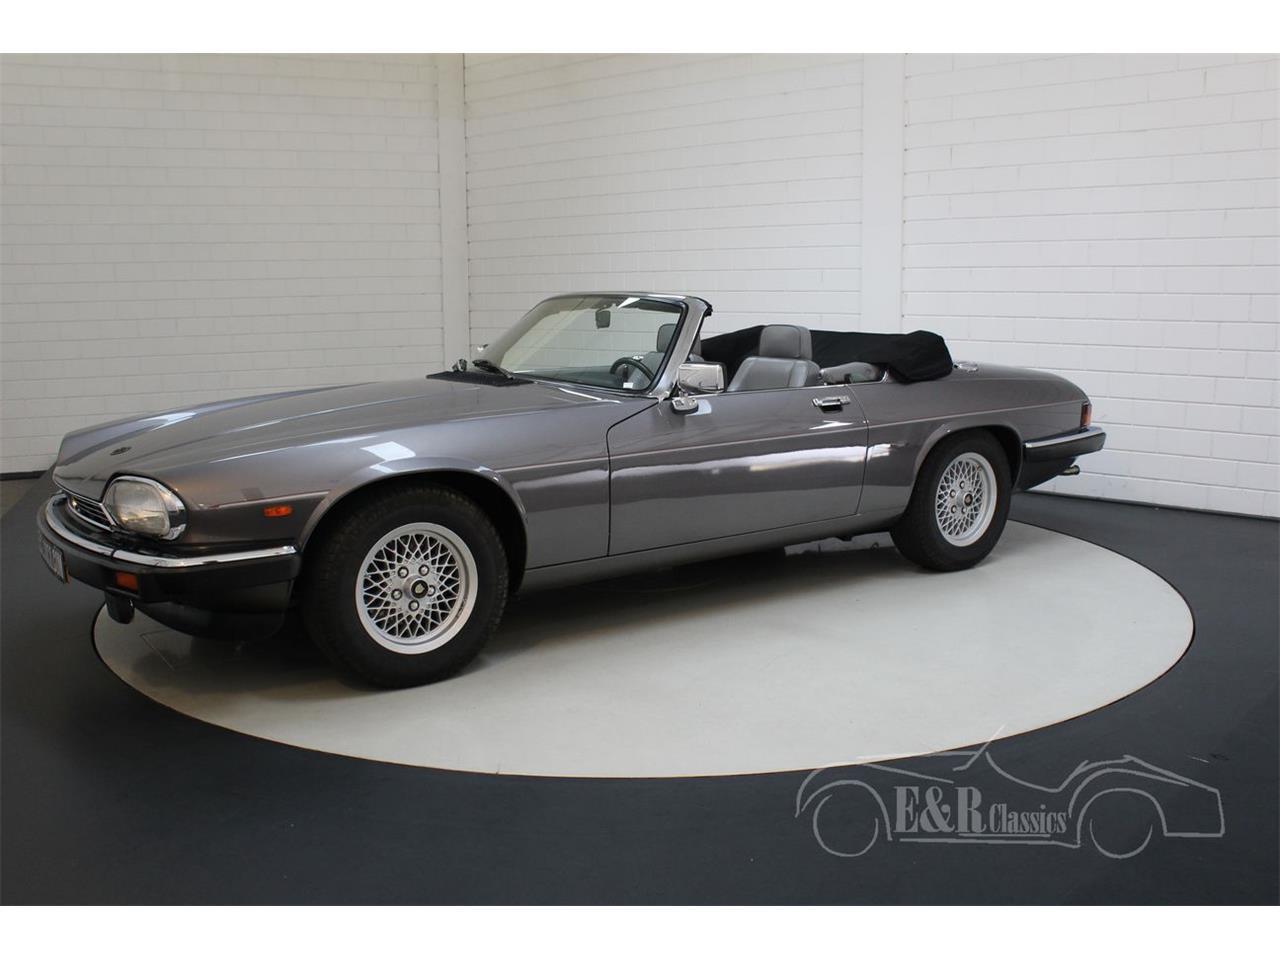 Large Picture of 1991 Jaguar XJS located in noord brabant - $39,050.00 - QQJ7